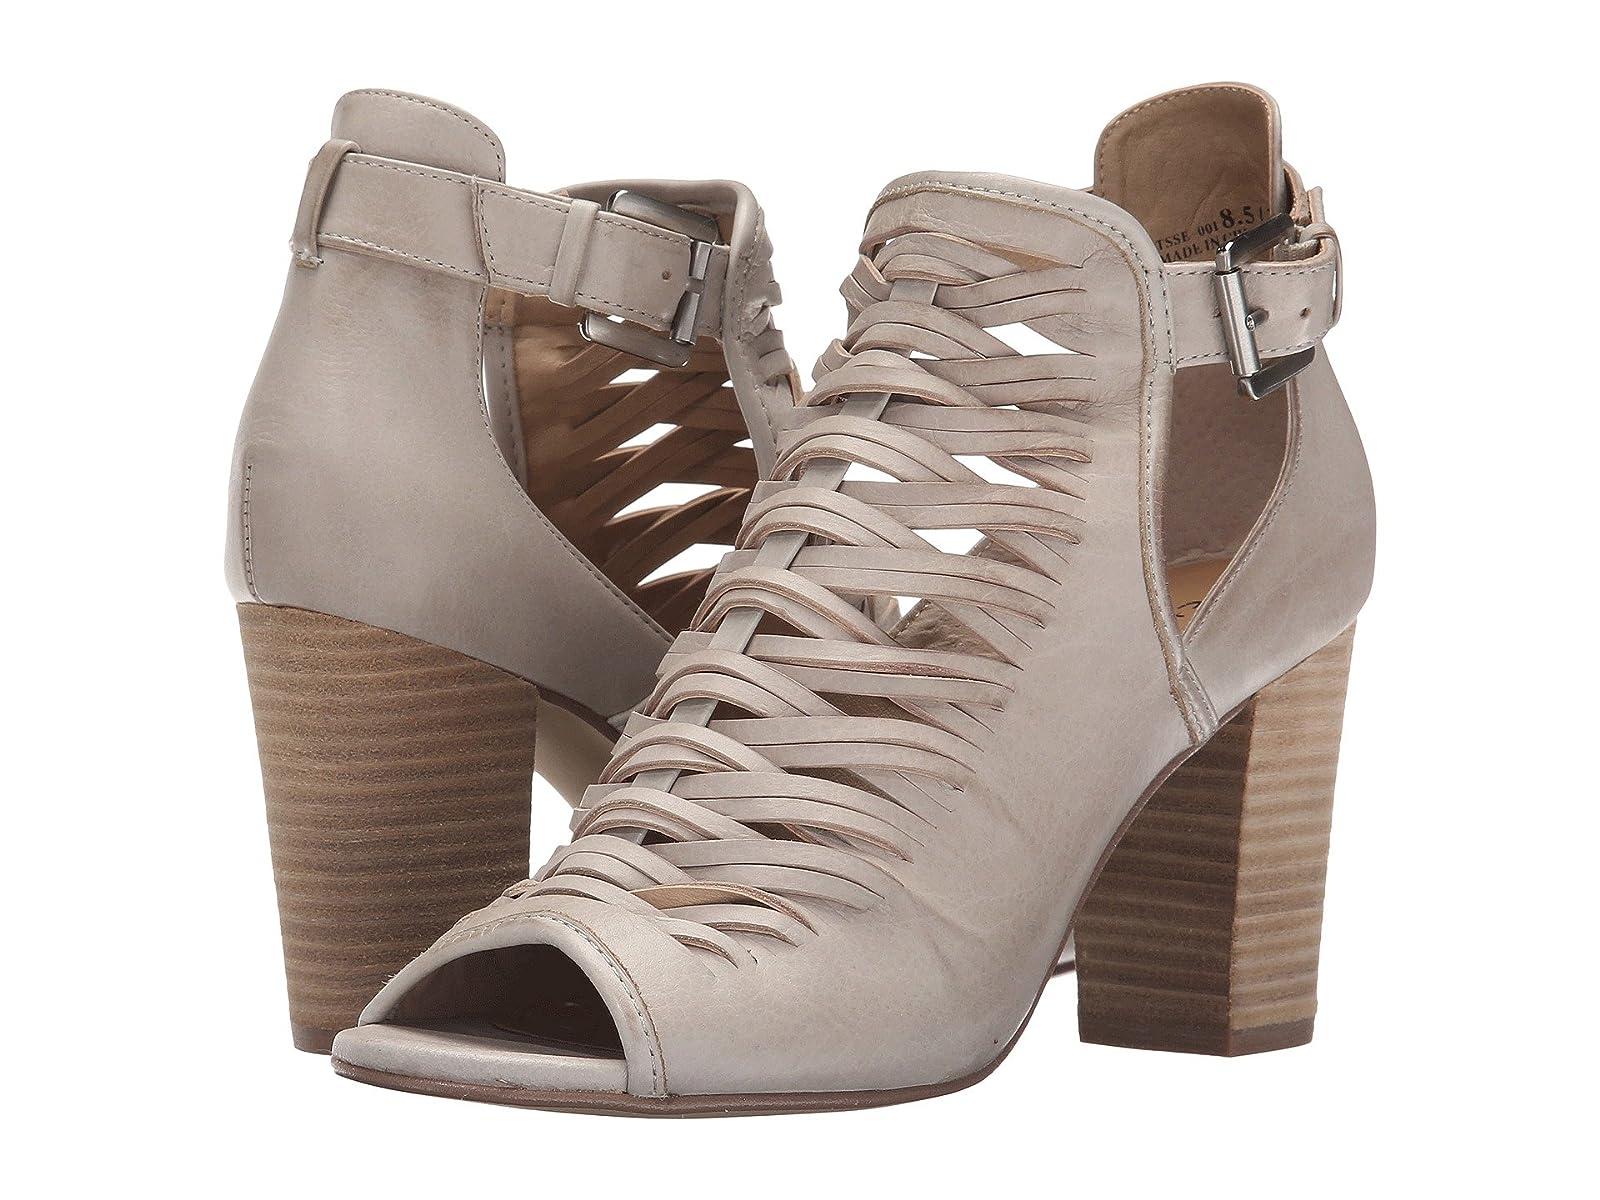 Chinese Laundry TatianaCheap and distinctive eye-catching shoes